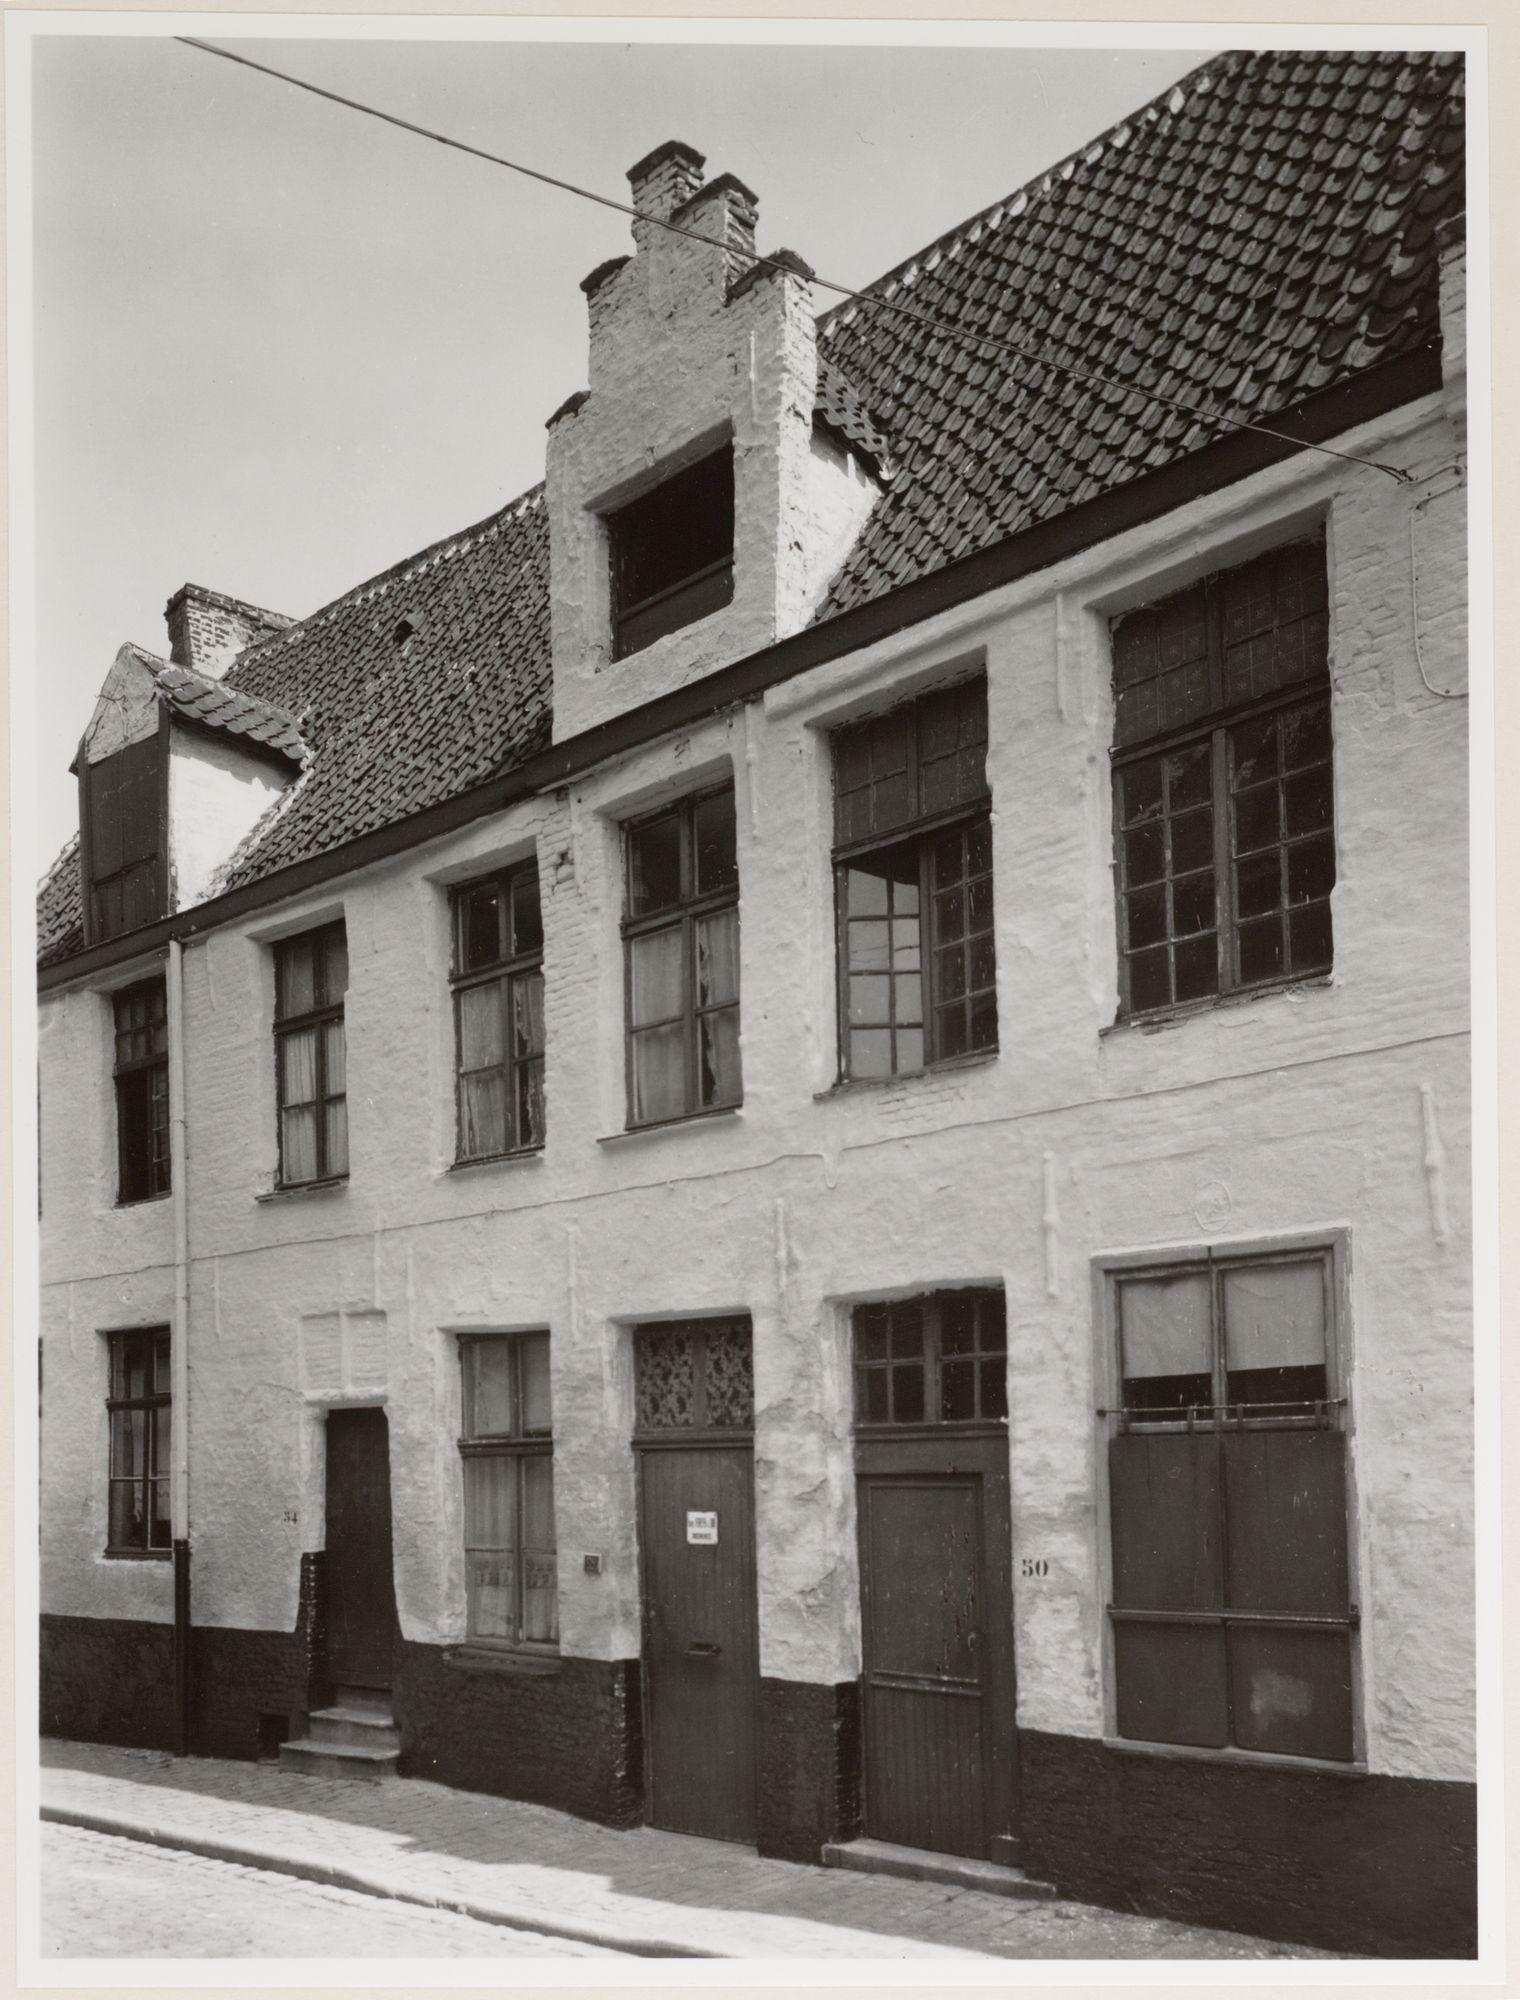 Gent: Veermanstraat (nu Veermanplein)